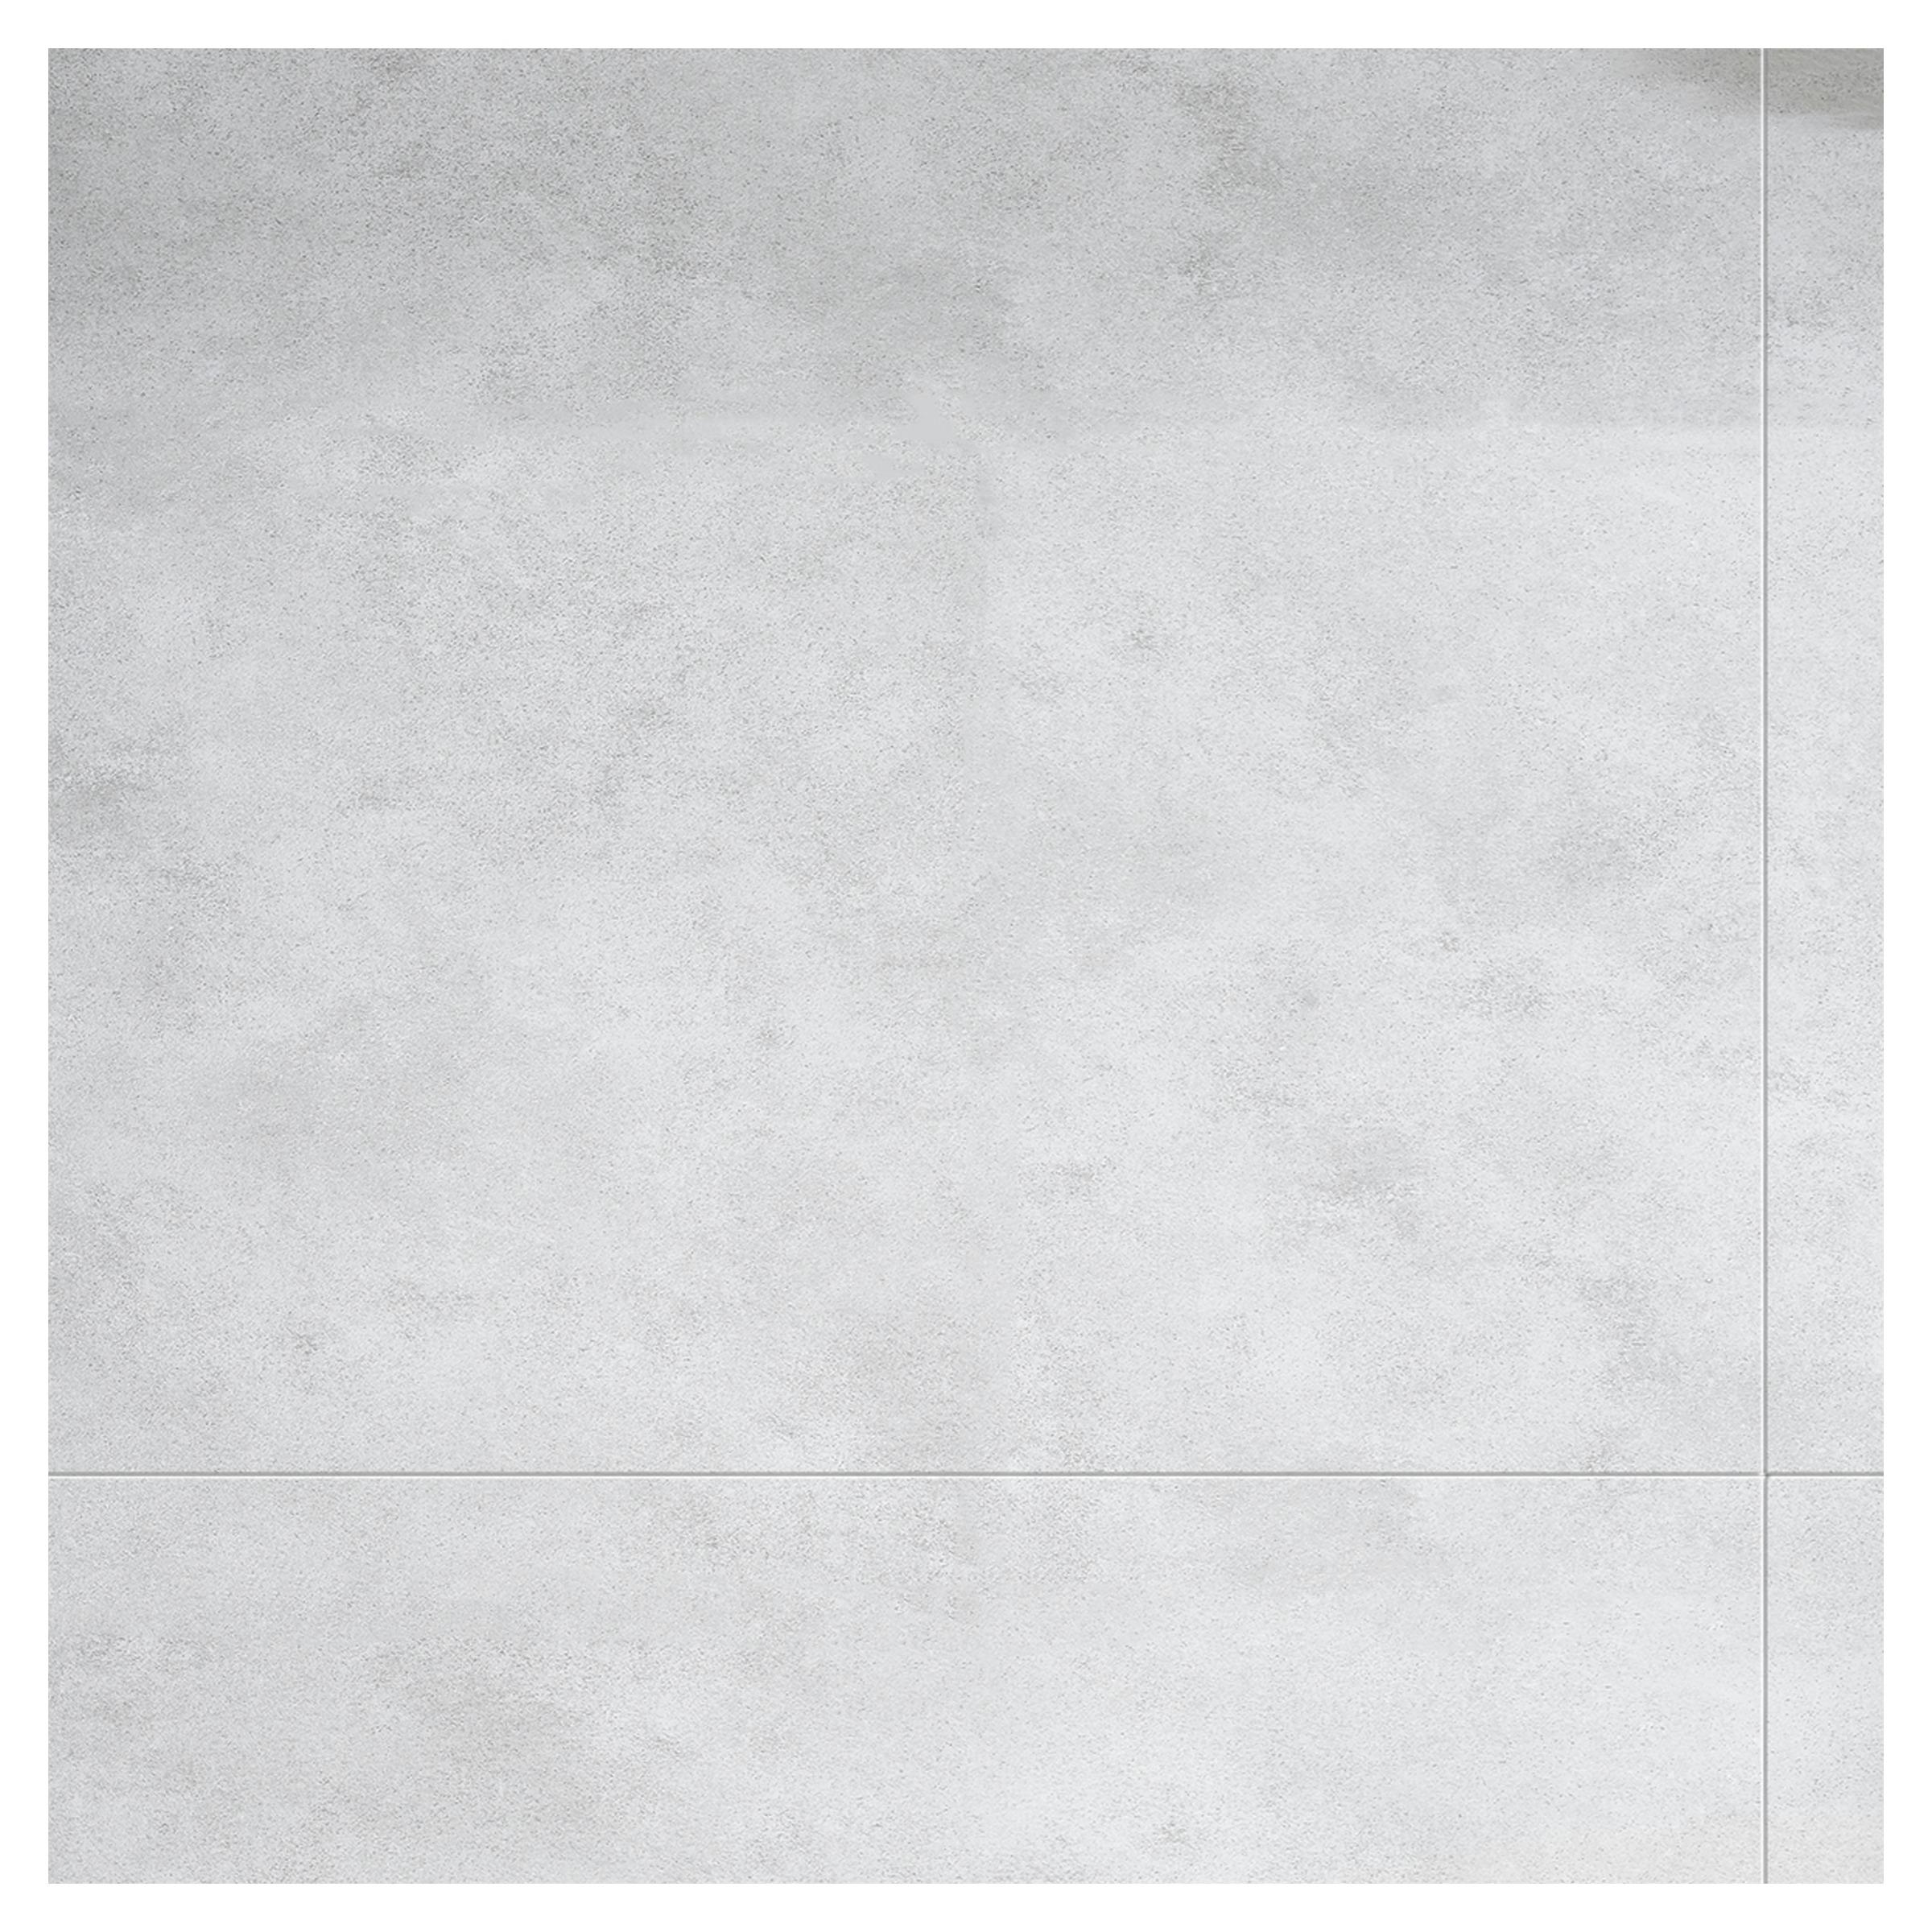 Dumaplast schroten Dumawall+ PVC cloudy wit 5 mm